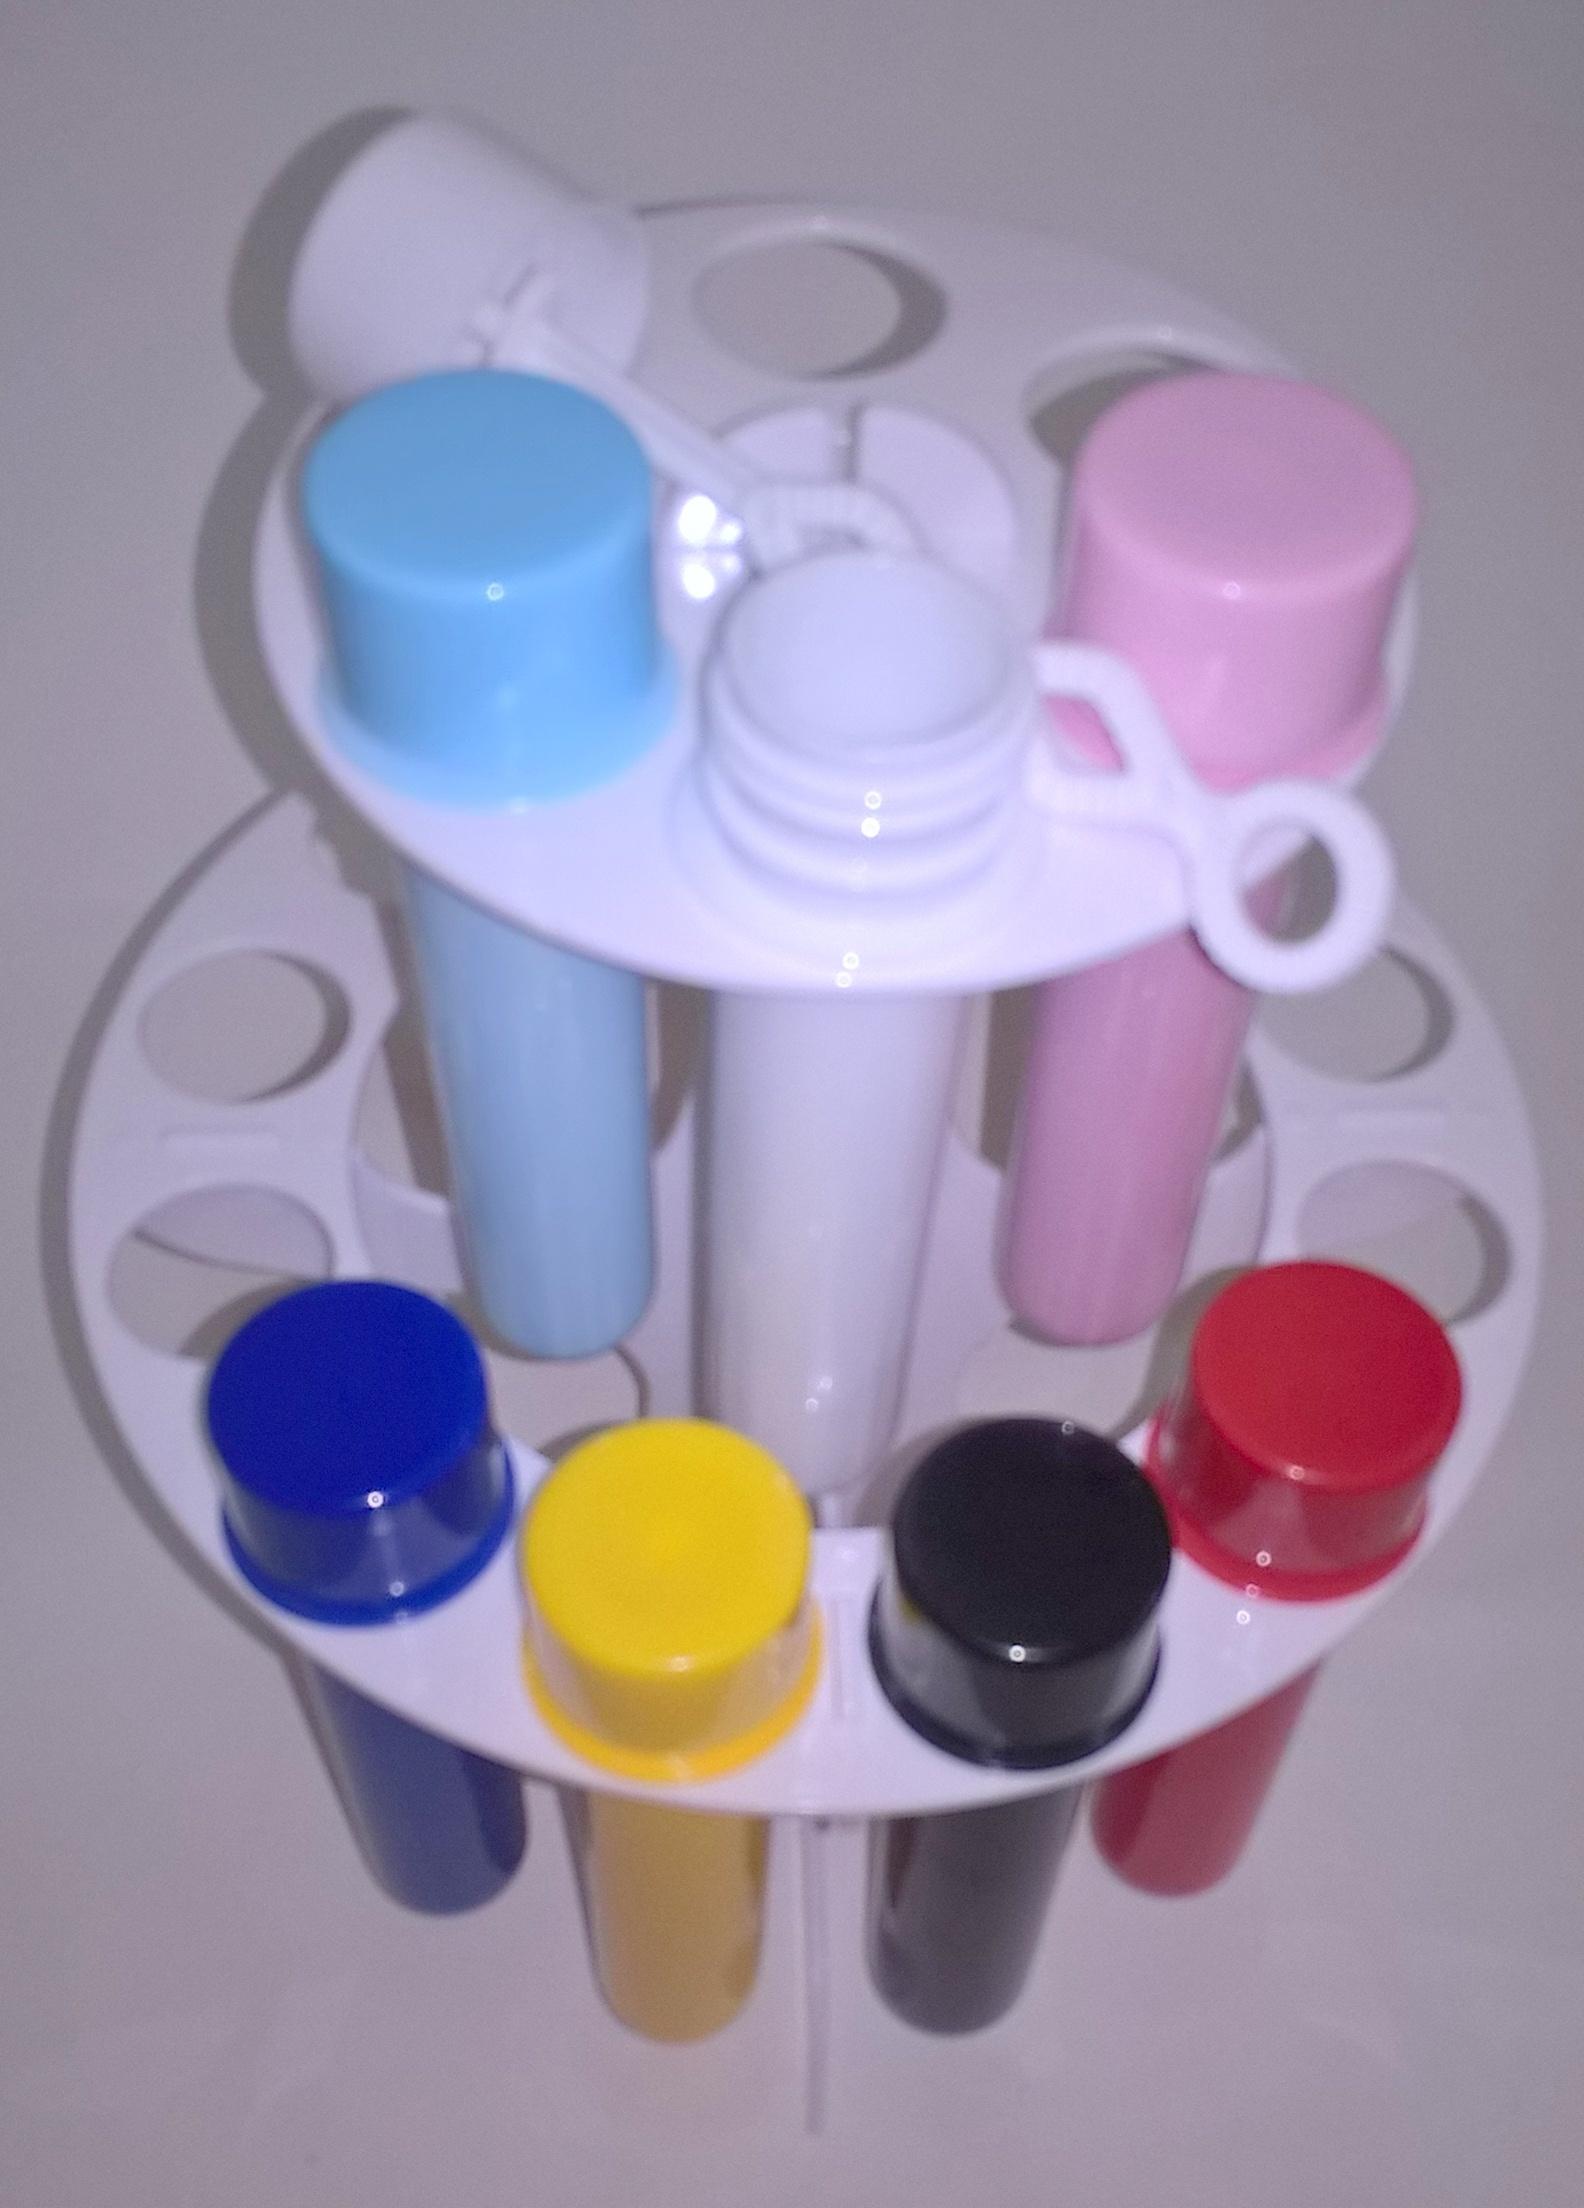 kit suporte +18 tubetes leitosos bolha de sabao